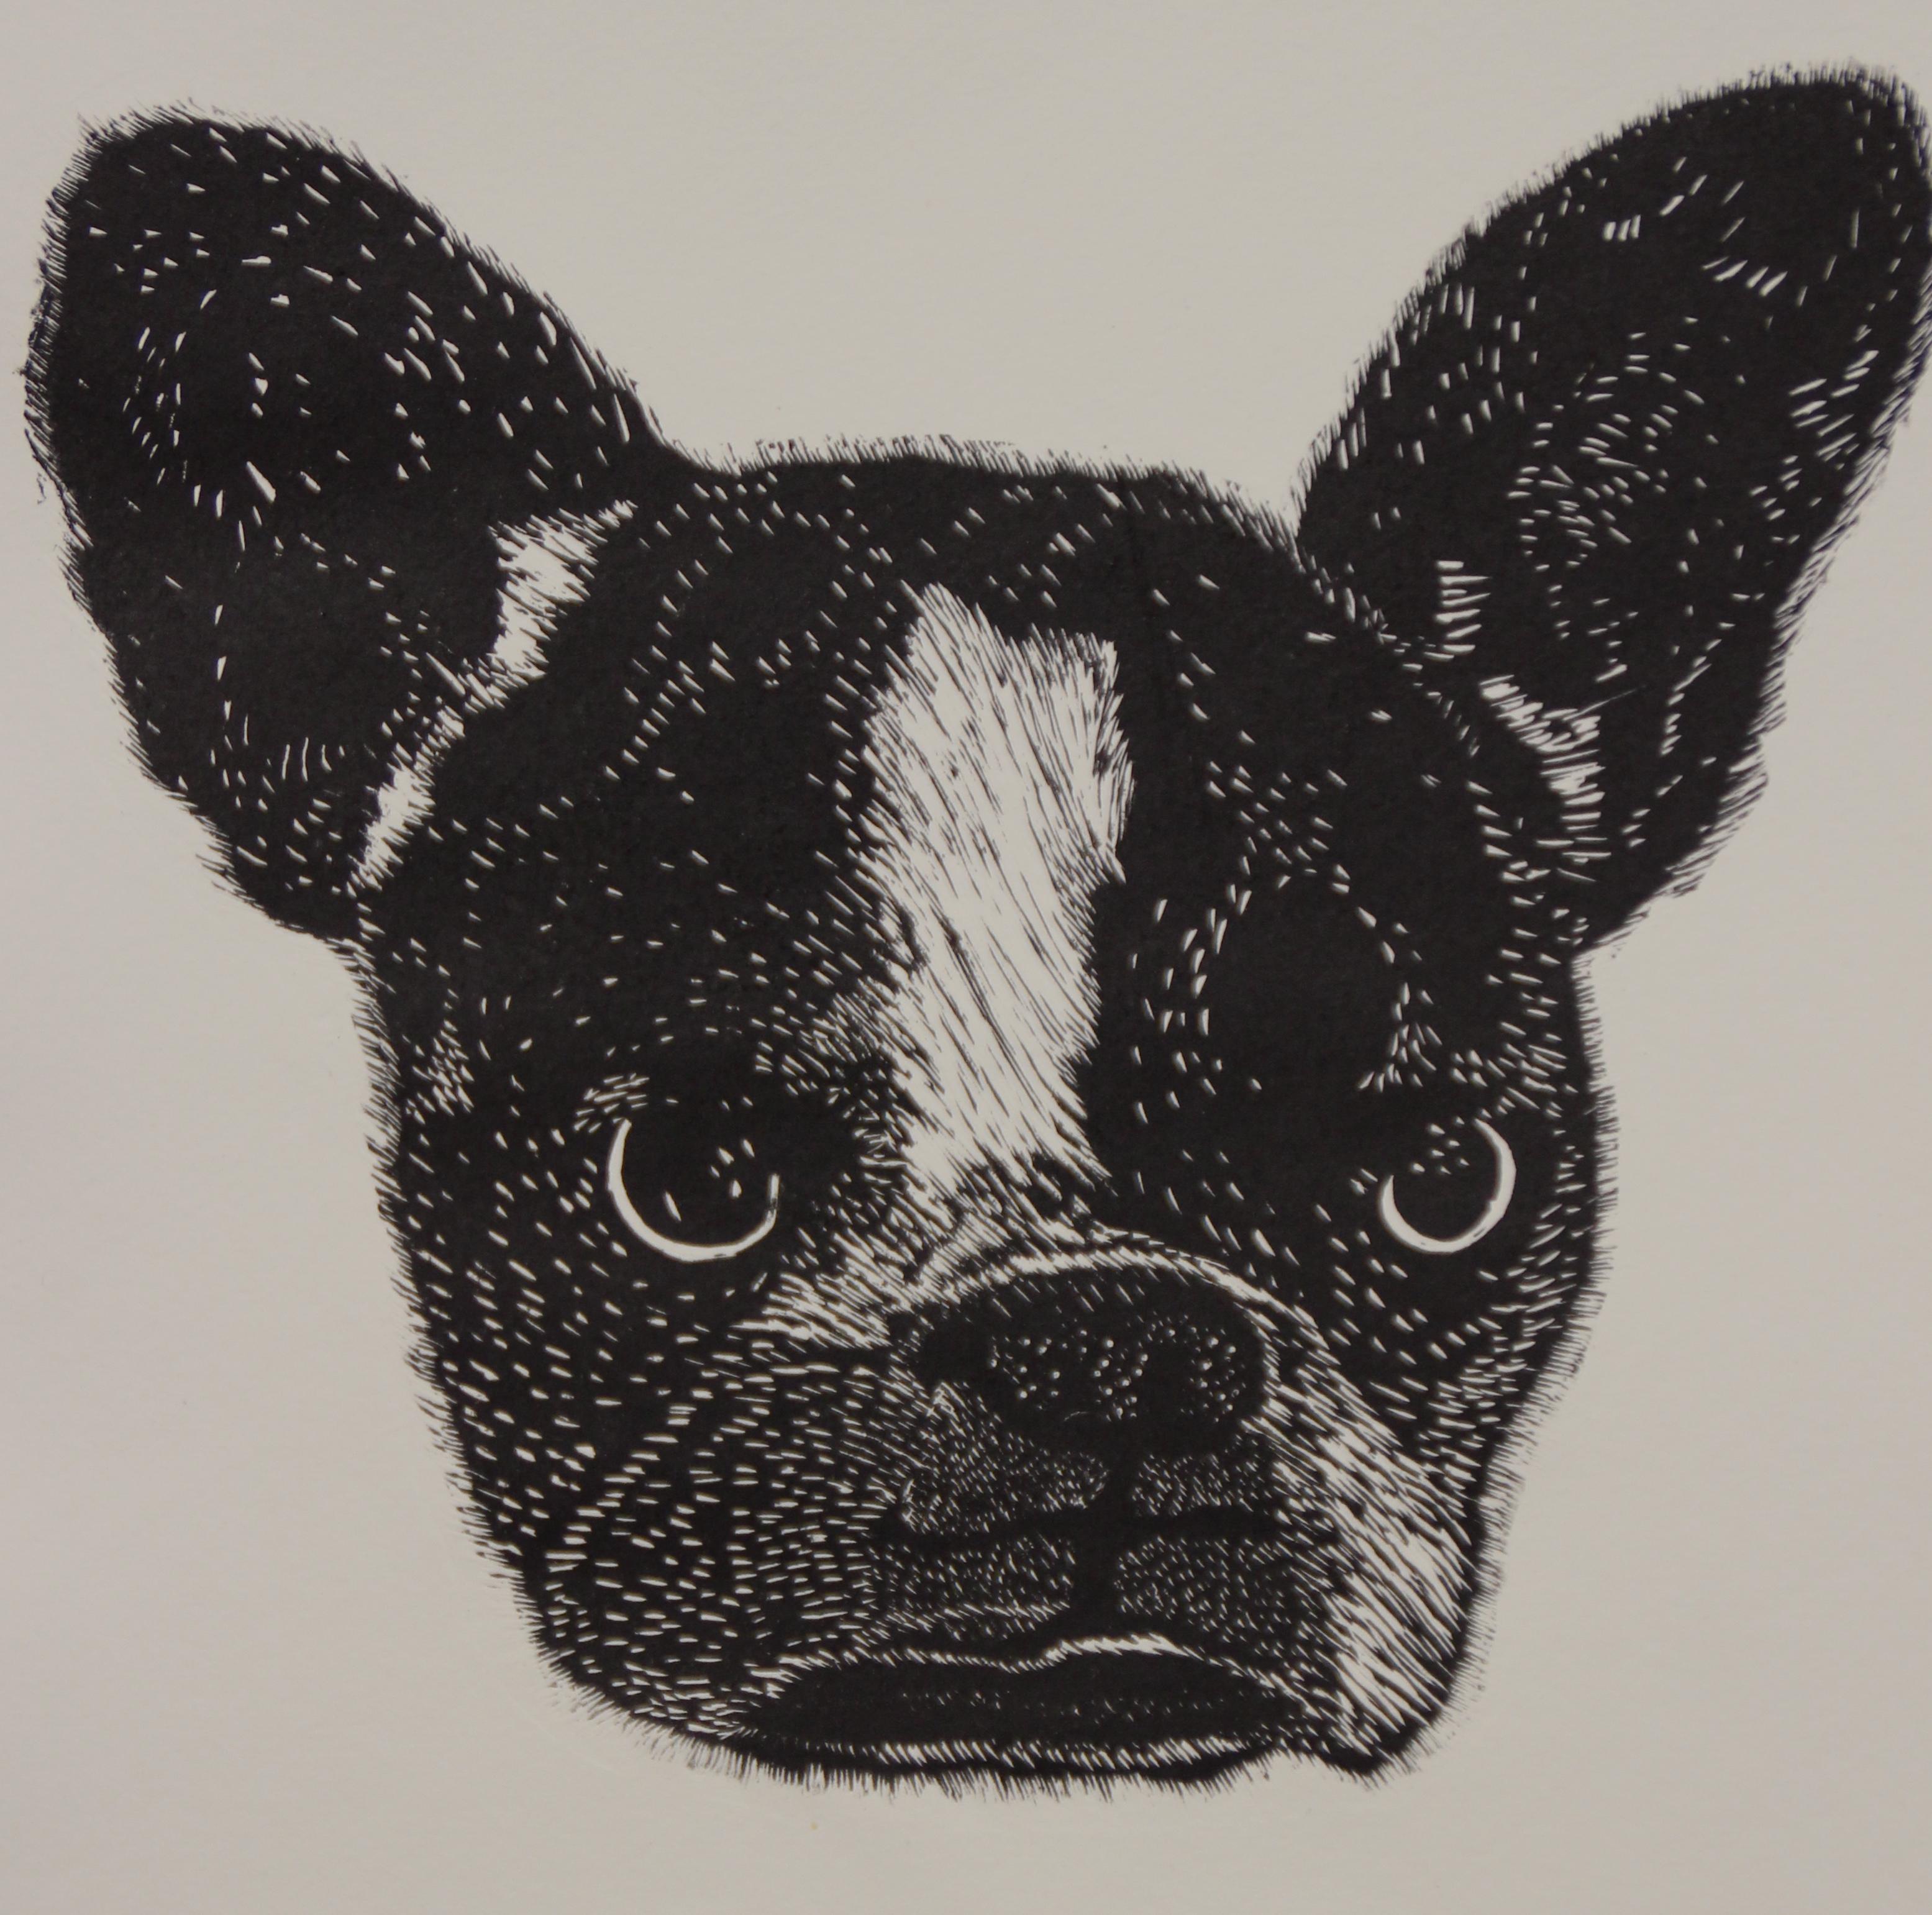 Black Dog - Vence, 2015